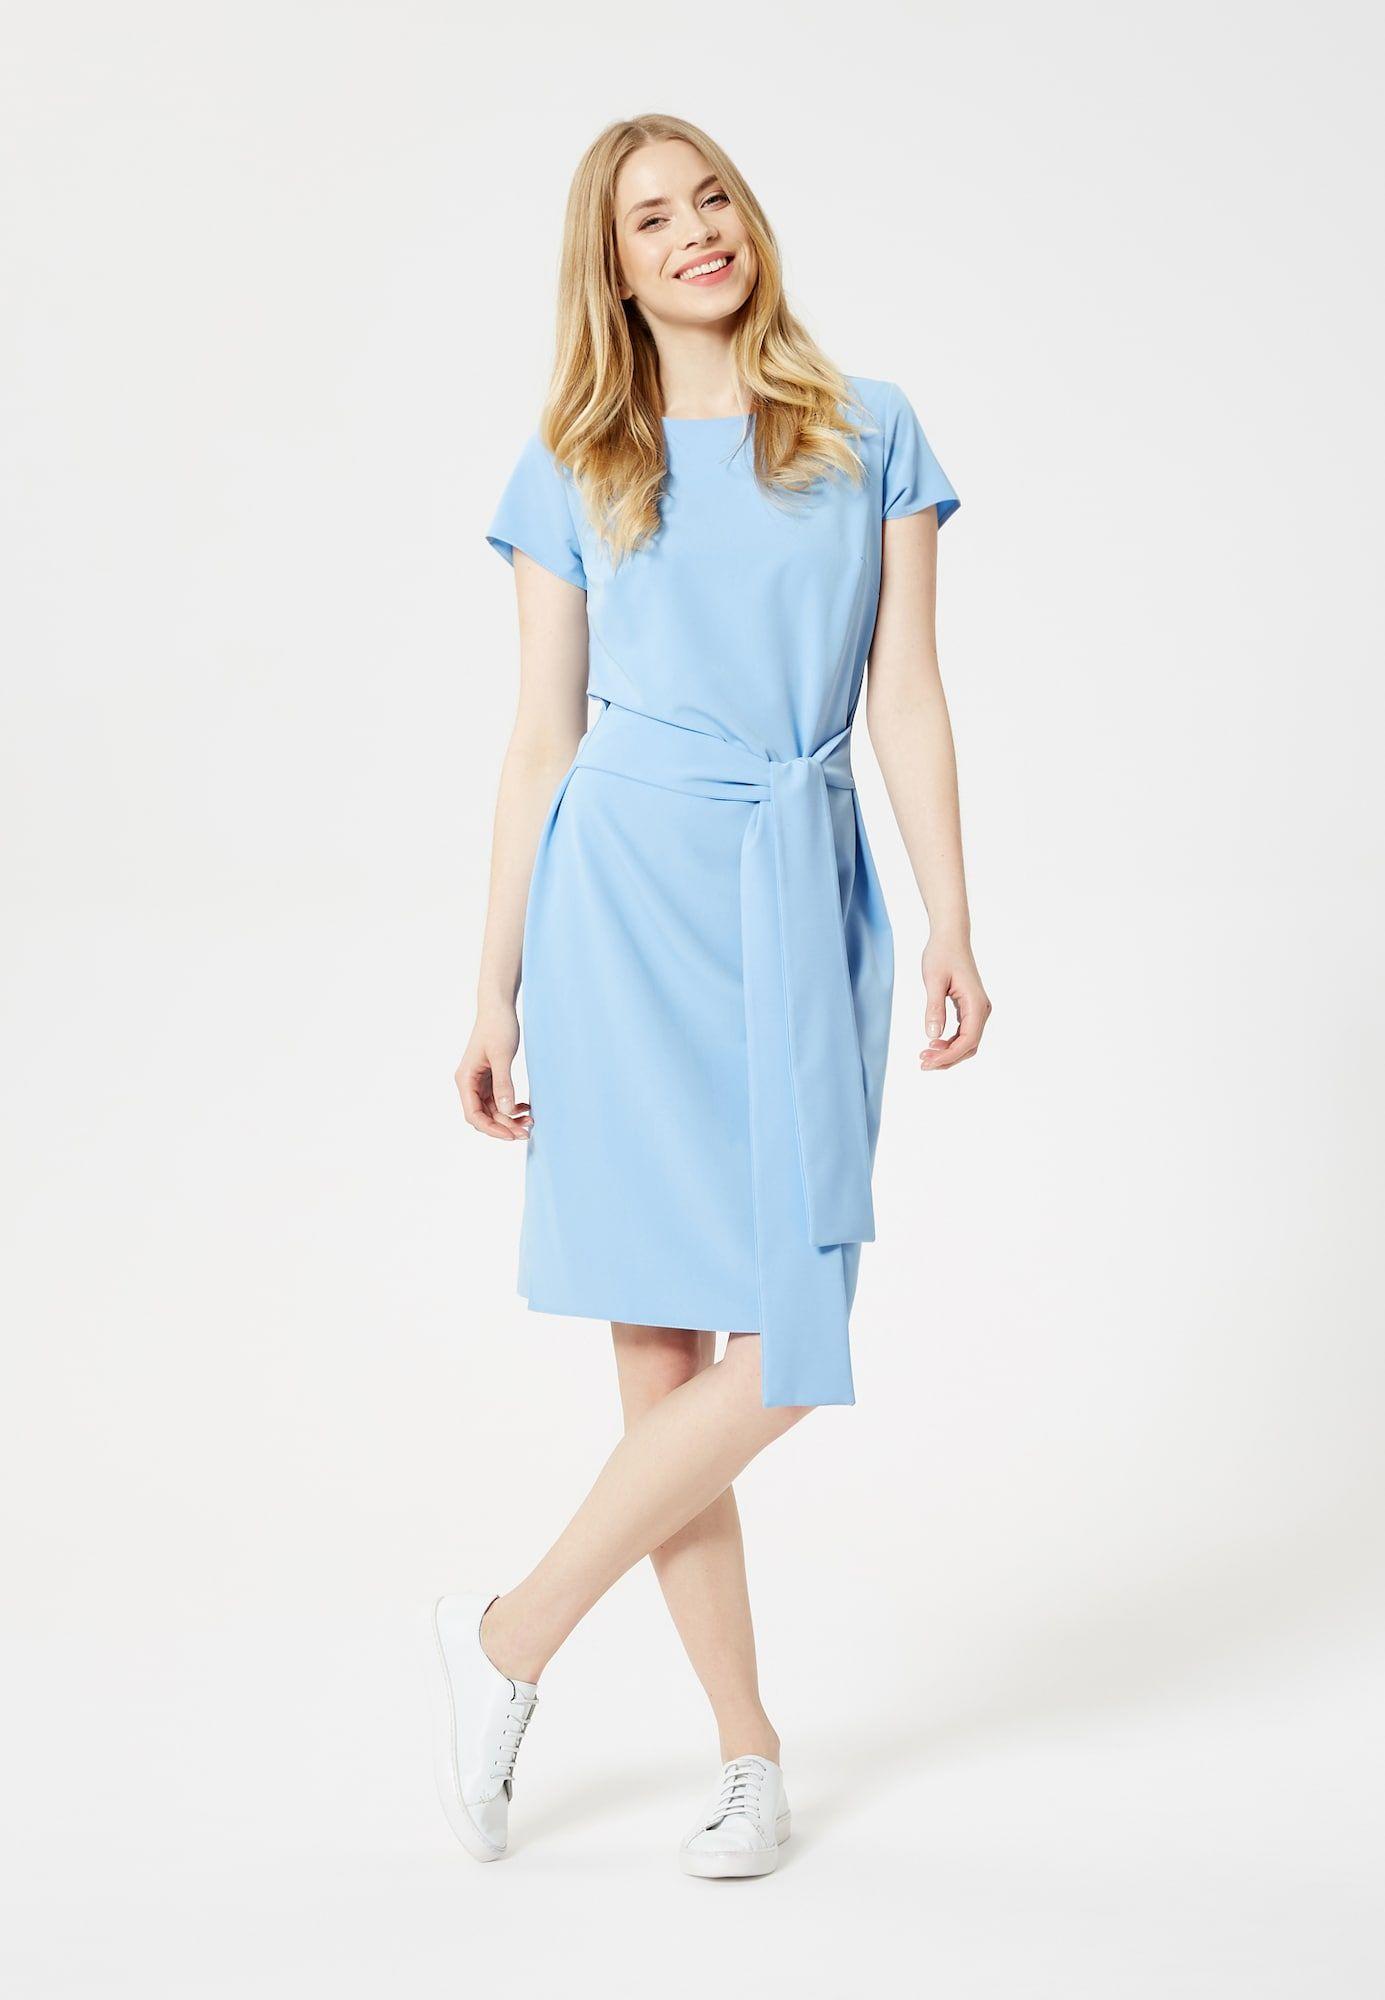 usha kleid damen, hellblau, größe 38 | kleider, oberhemden